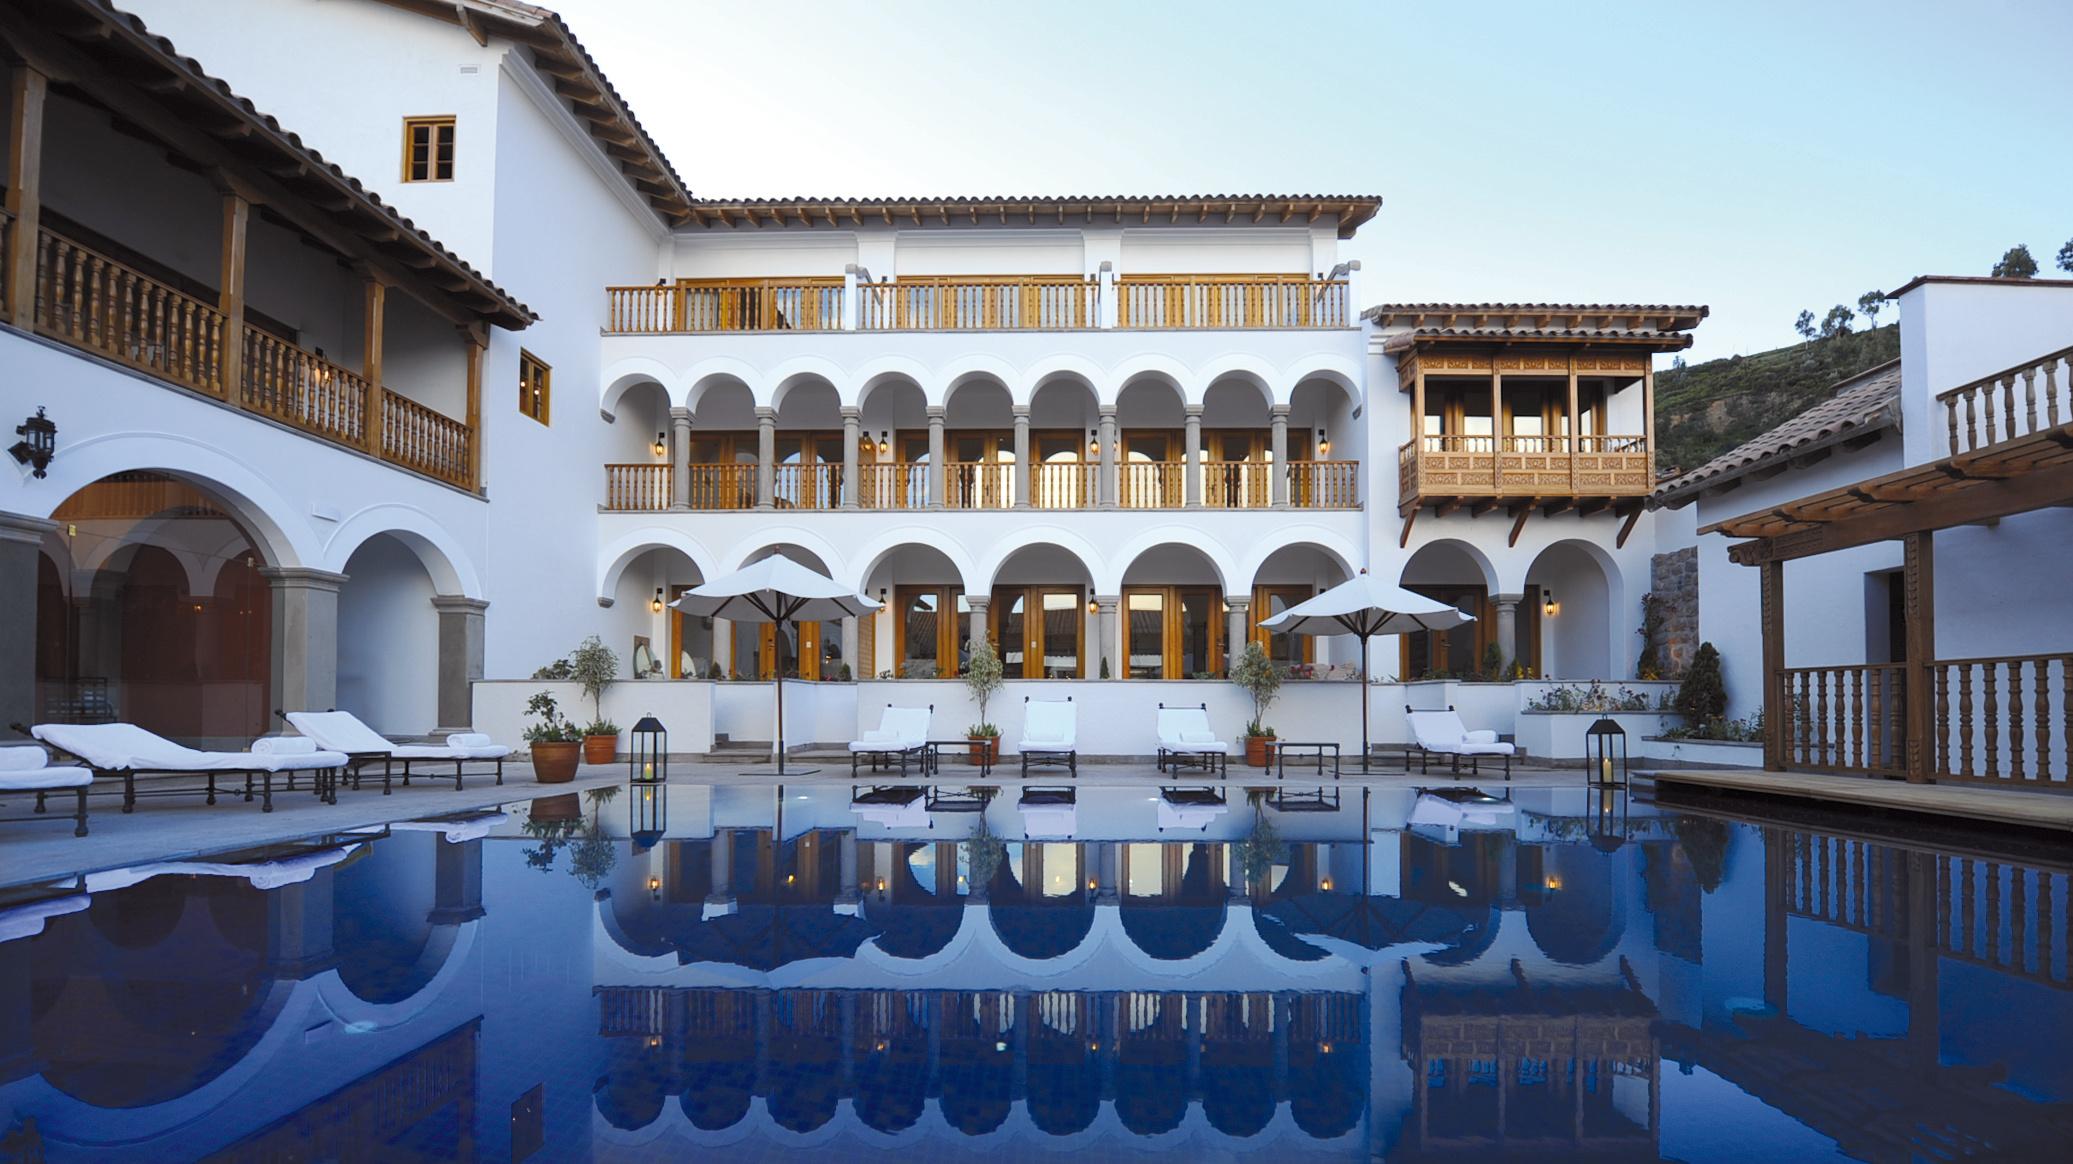 palacio-nazarenas-cuzco-peru